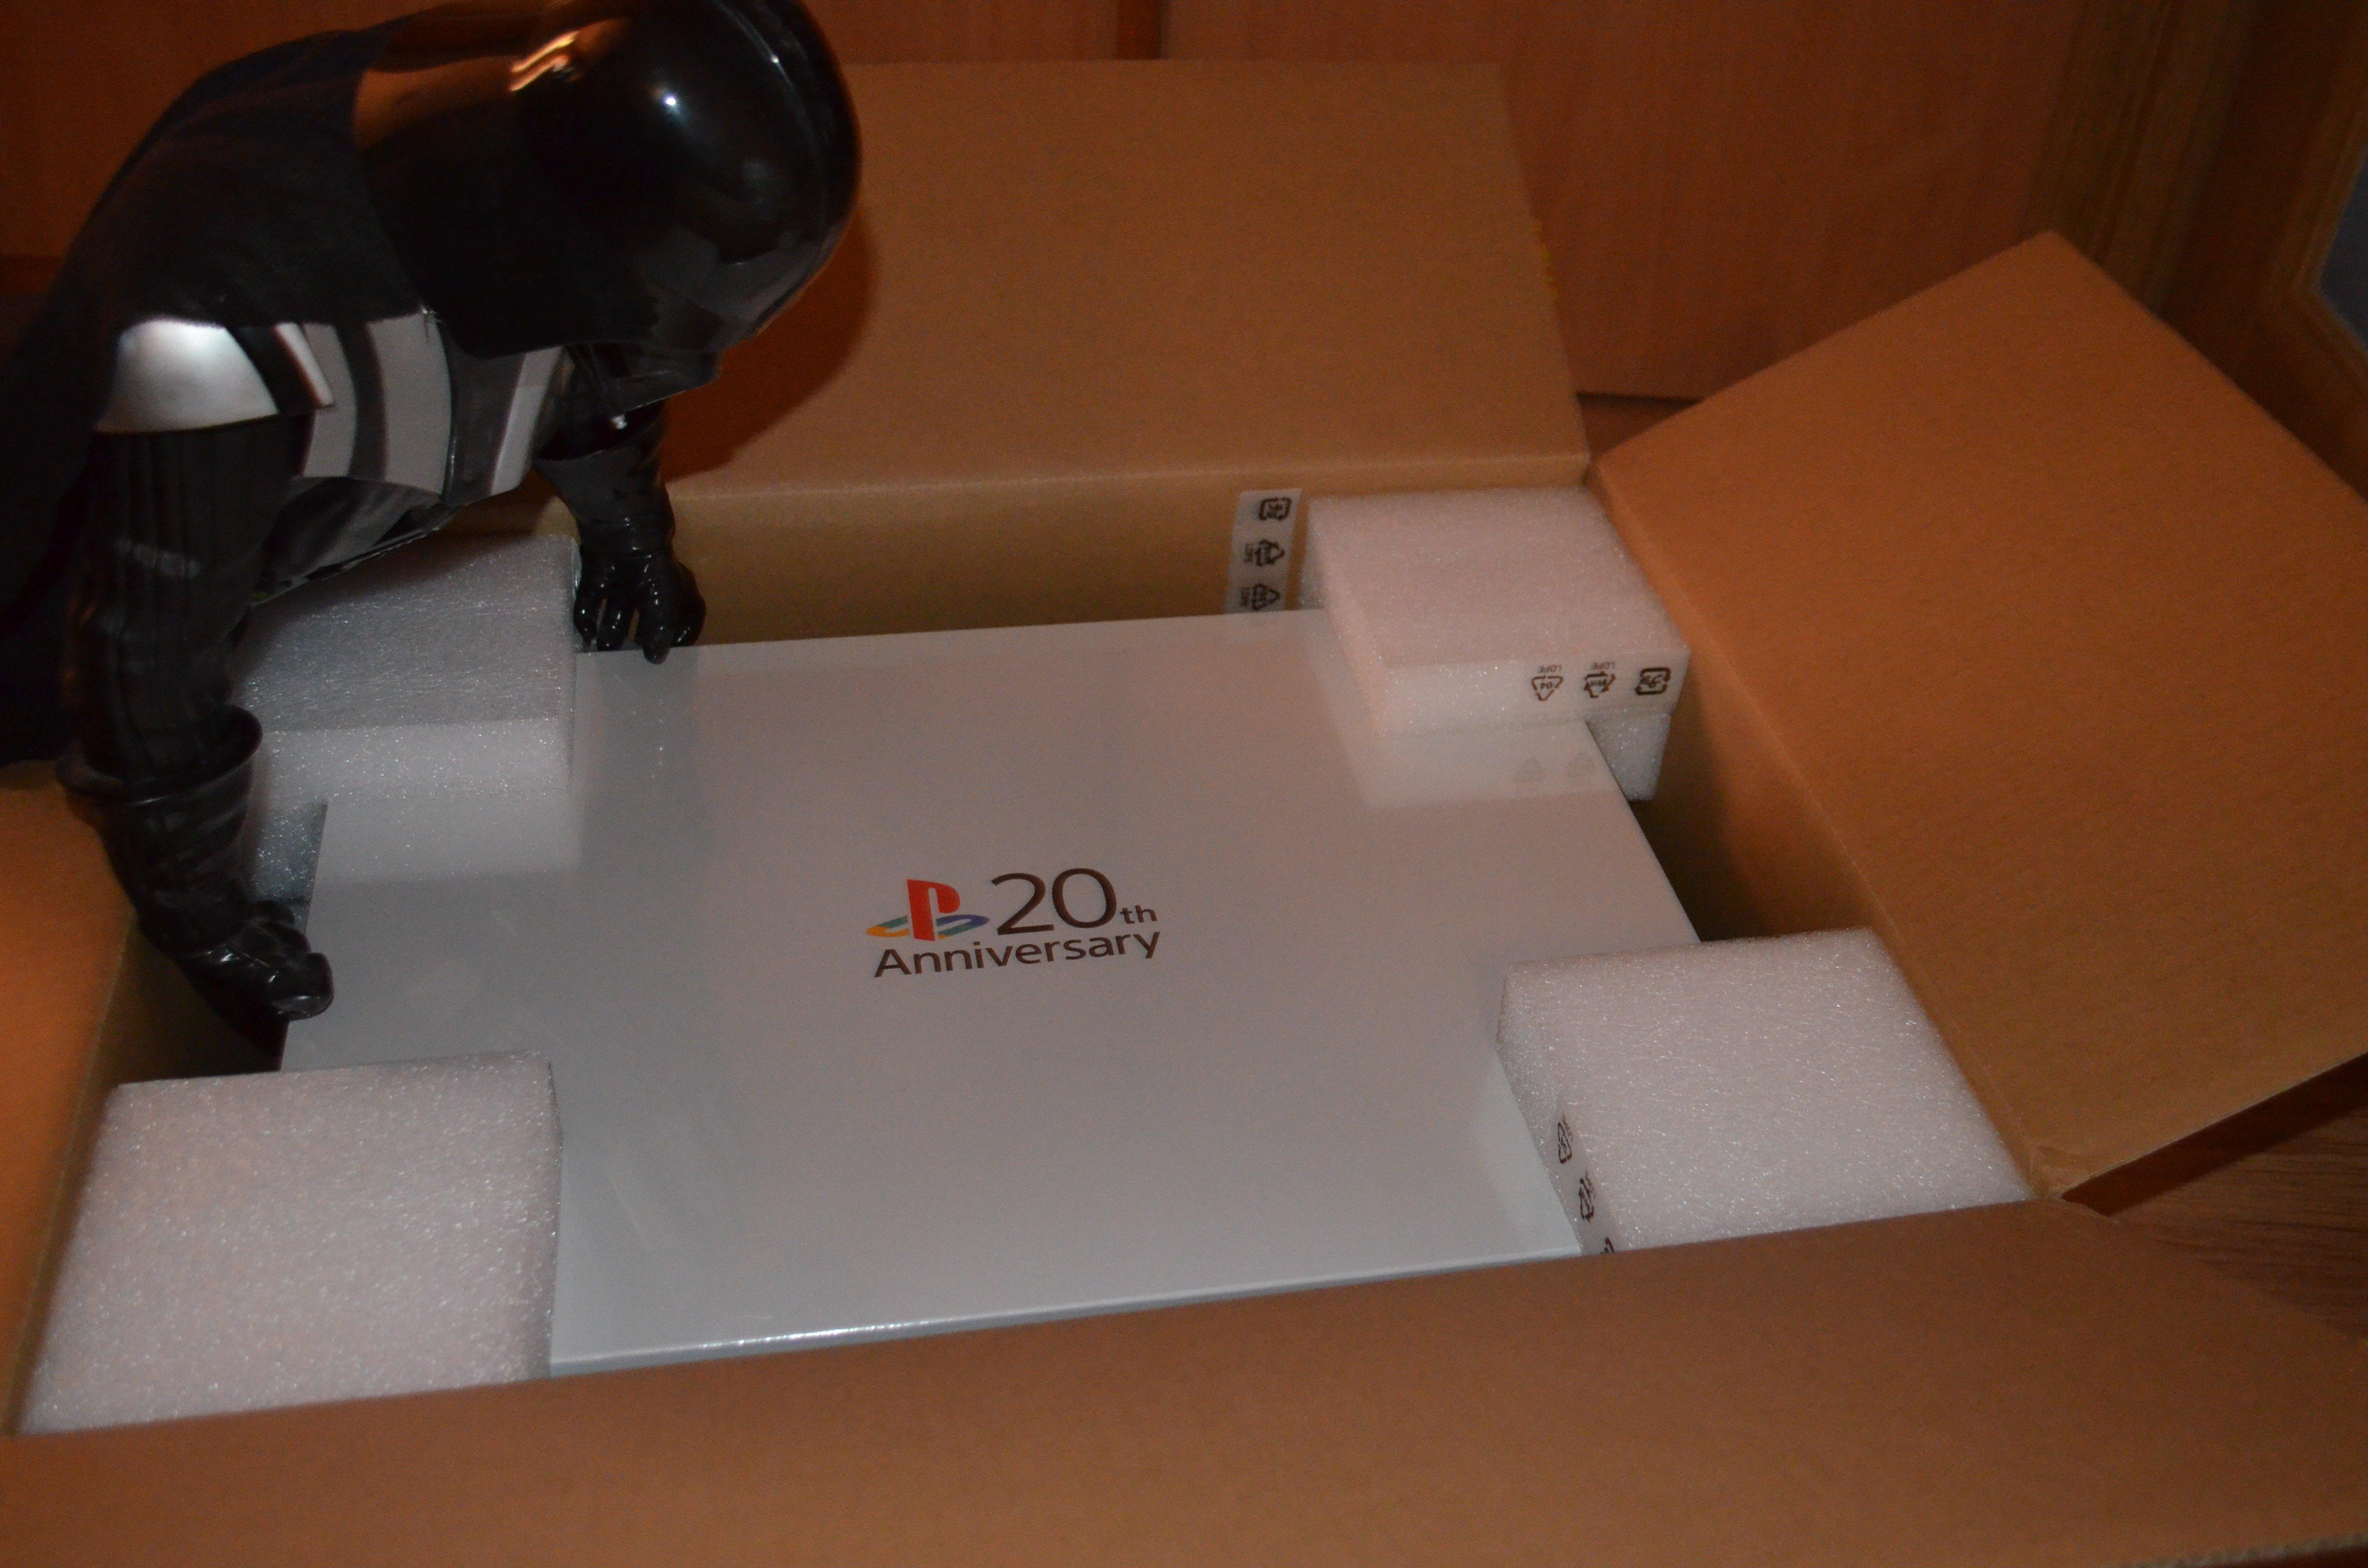 Анбоксинг Имперского издания Playstation 4 Anniversary Edition - Изображение 10